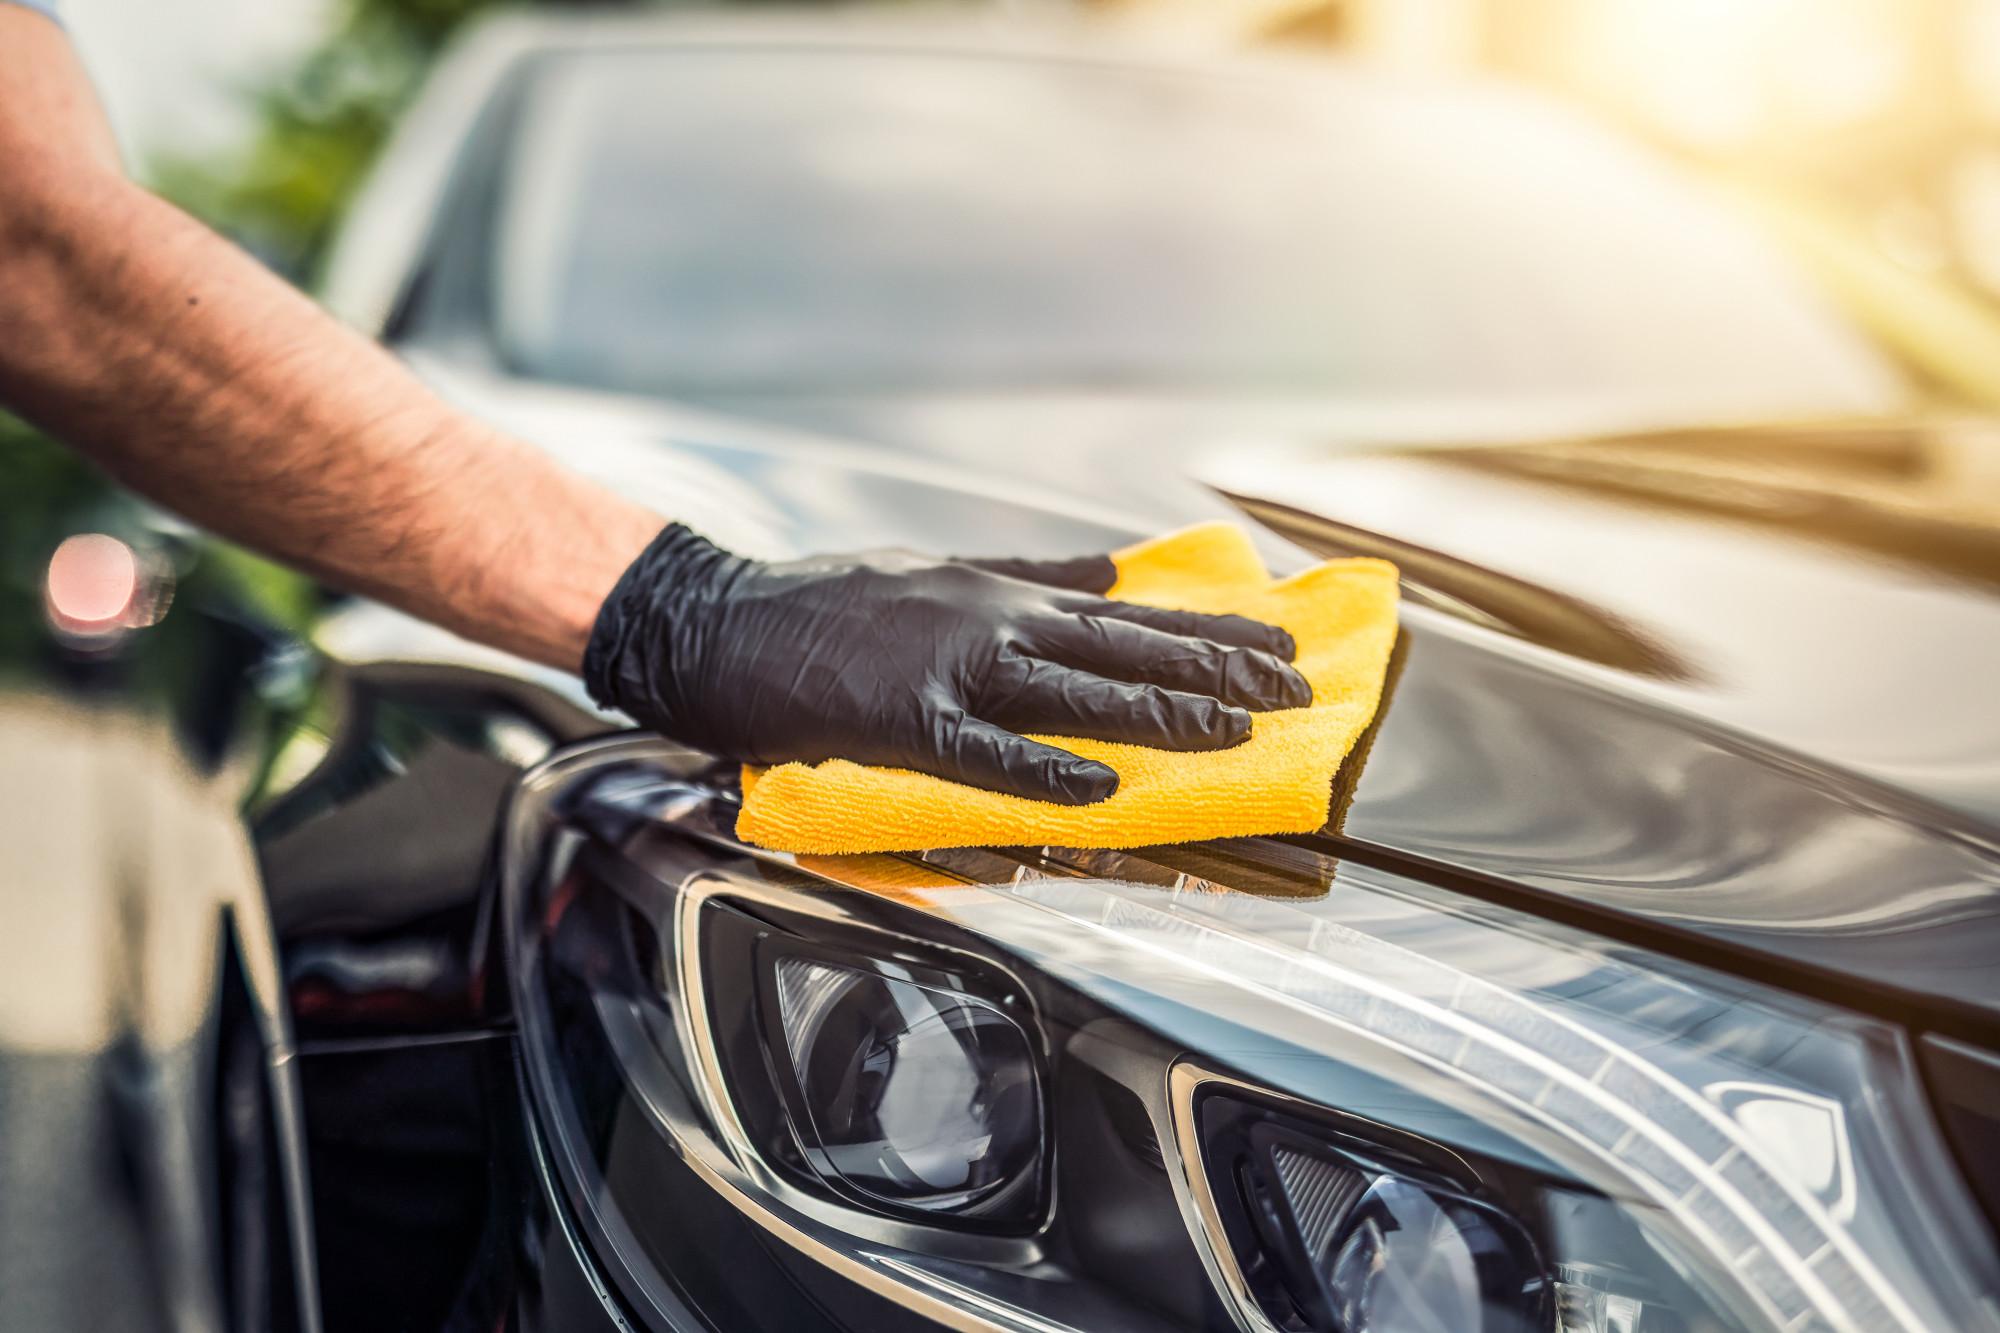 Detailing Your Car